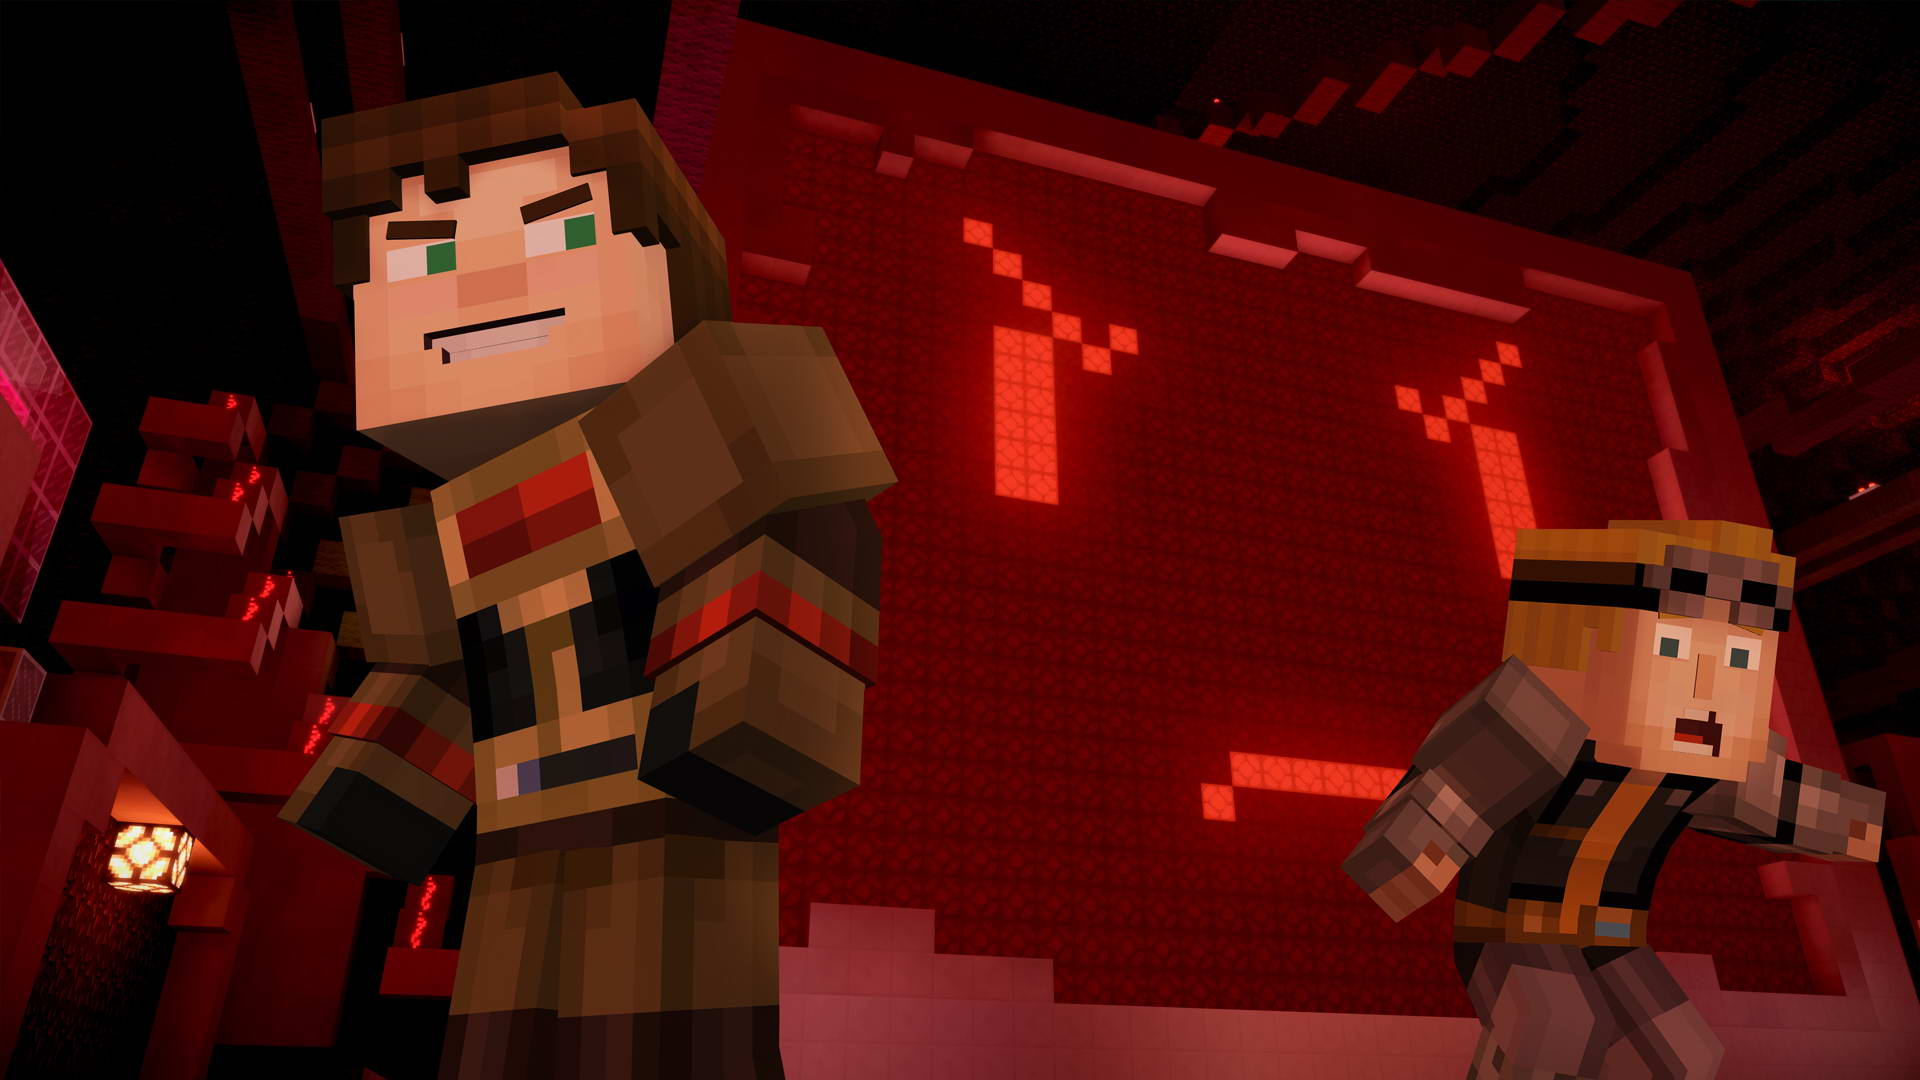 Minecraft с Модом Icbm зомби прохождение - самыймегасайт.рф